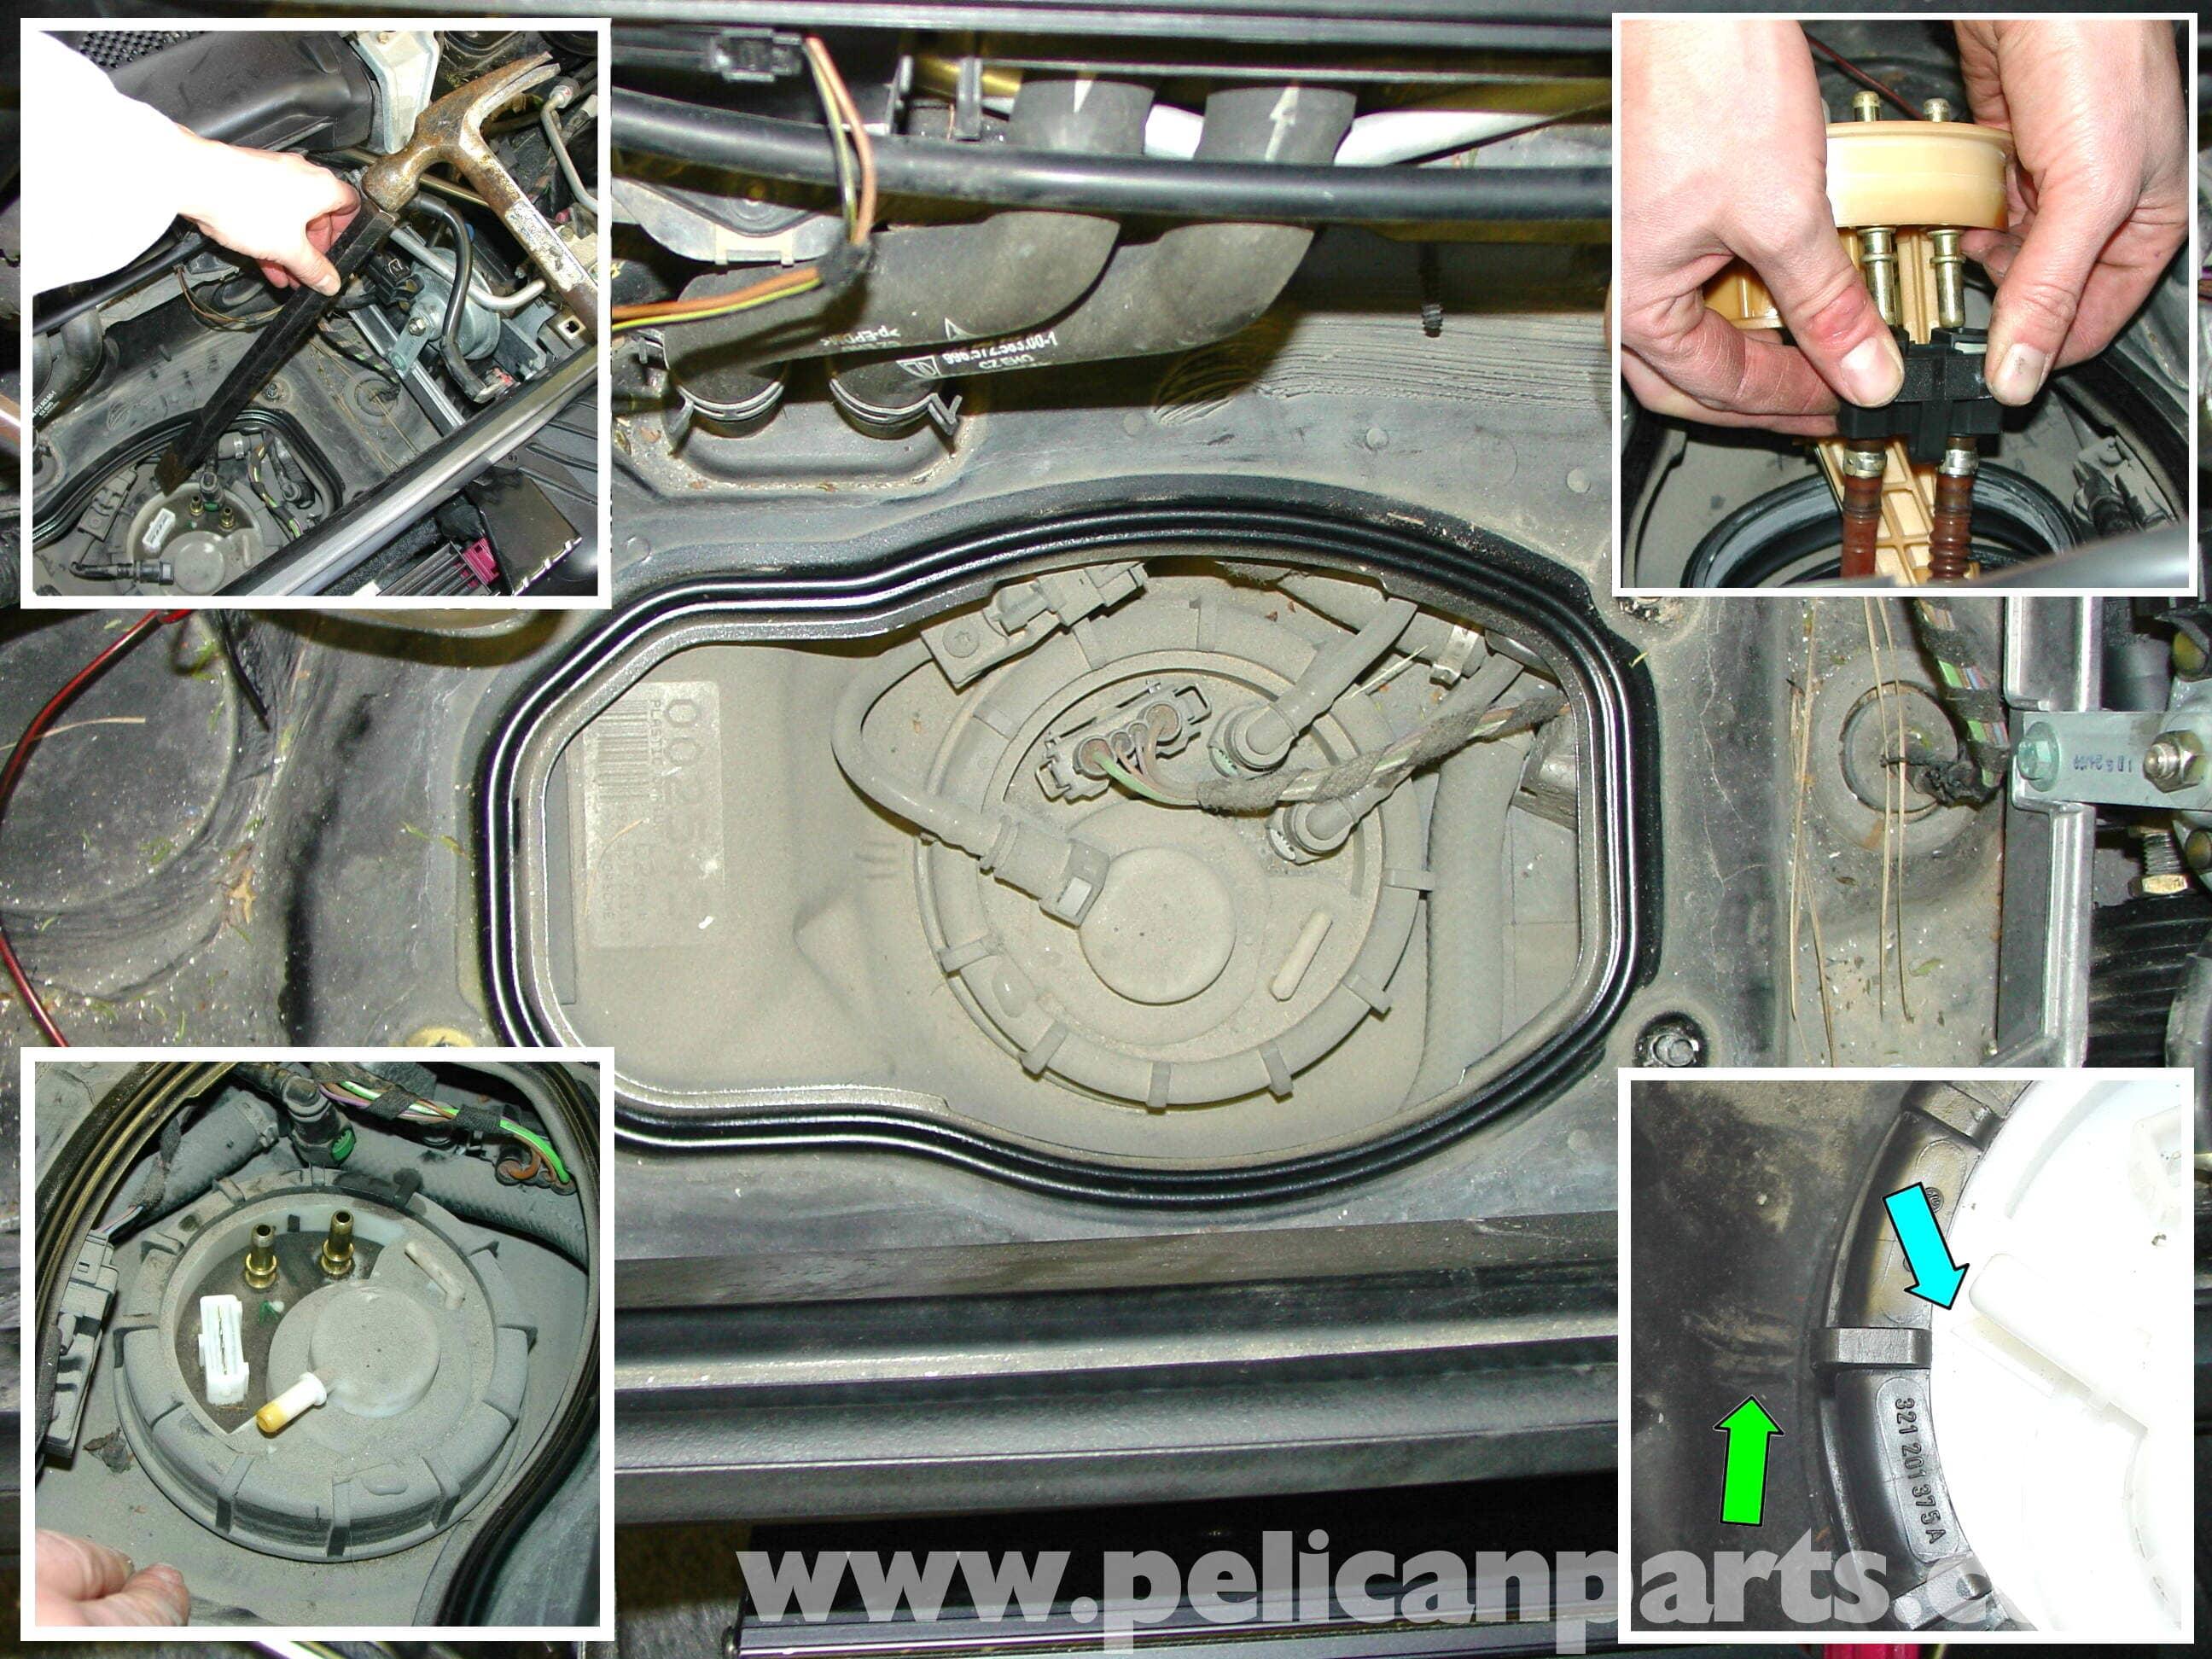 porsche 911 headlight wiring diagram prestige induction cooker circuit carrera fuel pump replacement - 996 (1998-2005) 997 (2005-2012) pelican parts ...